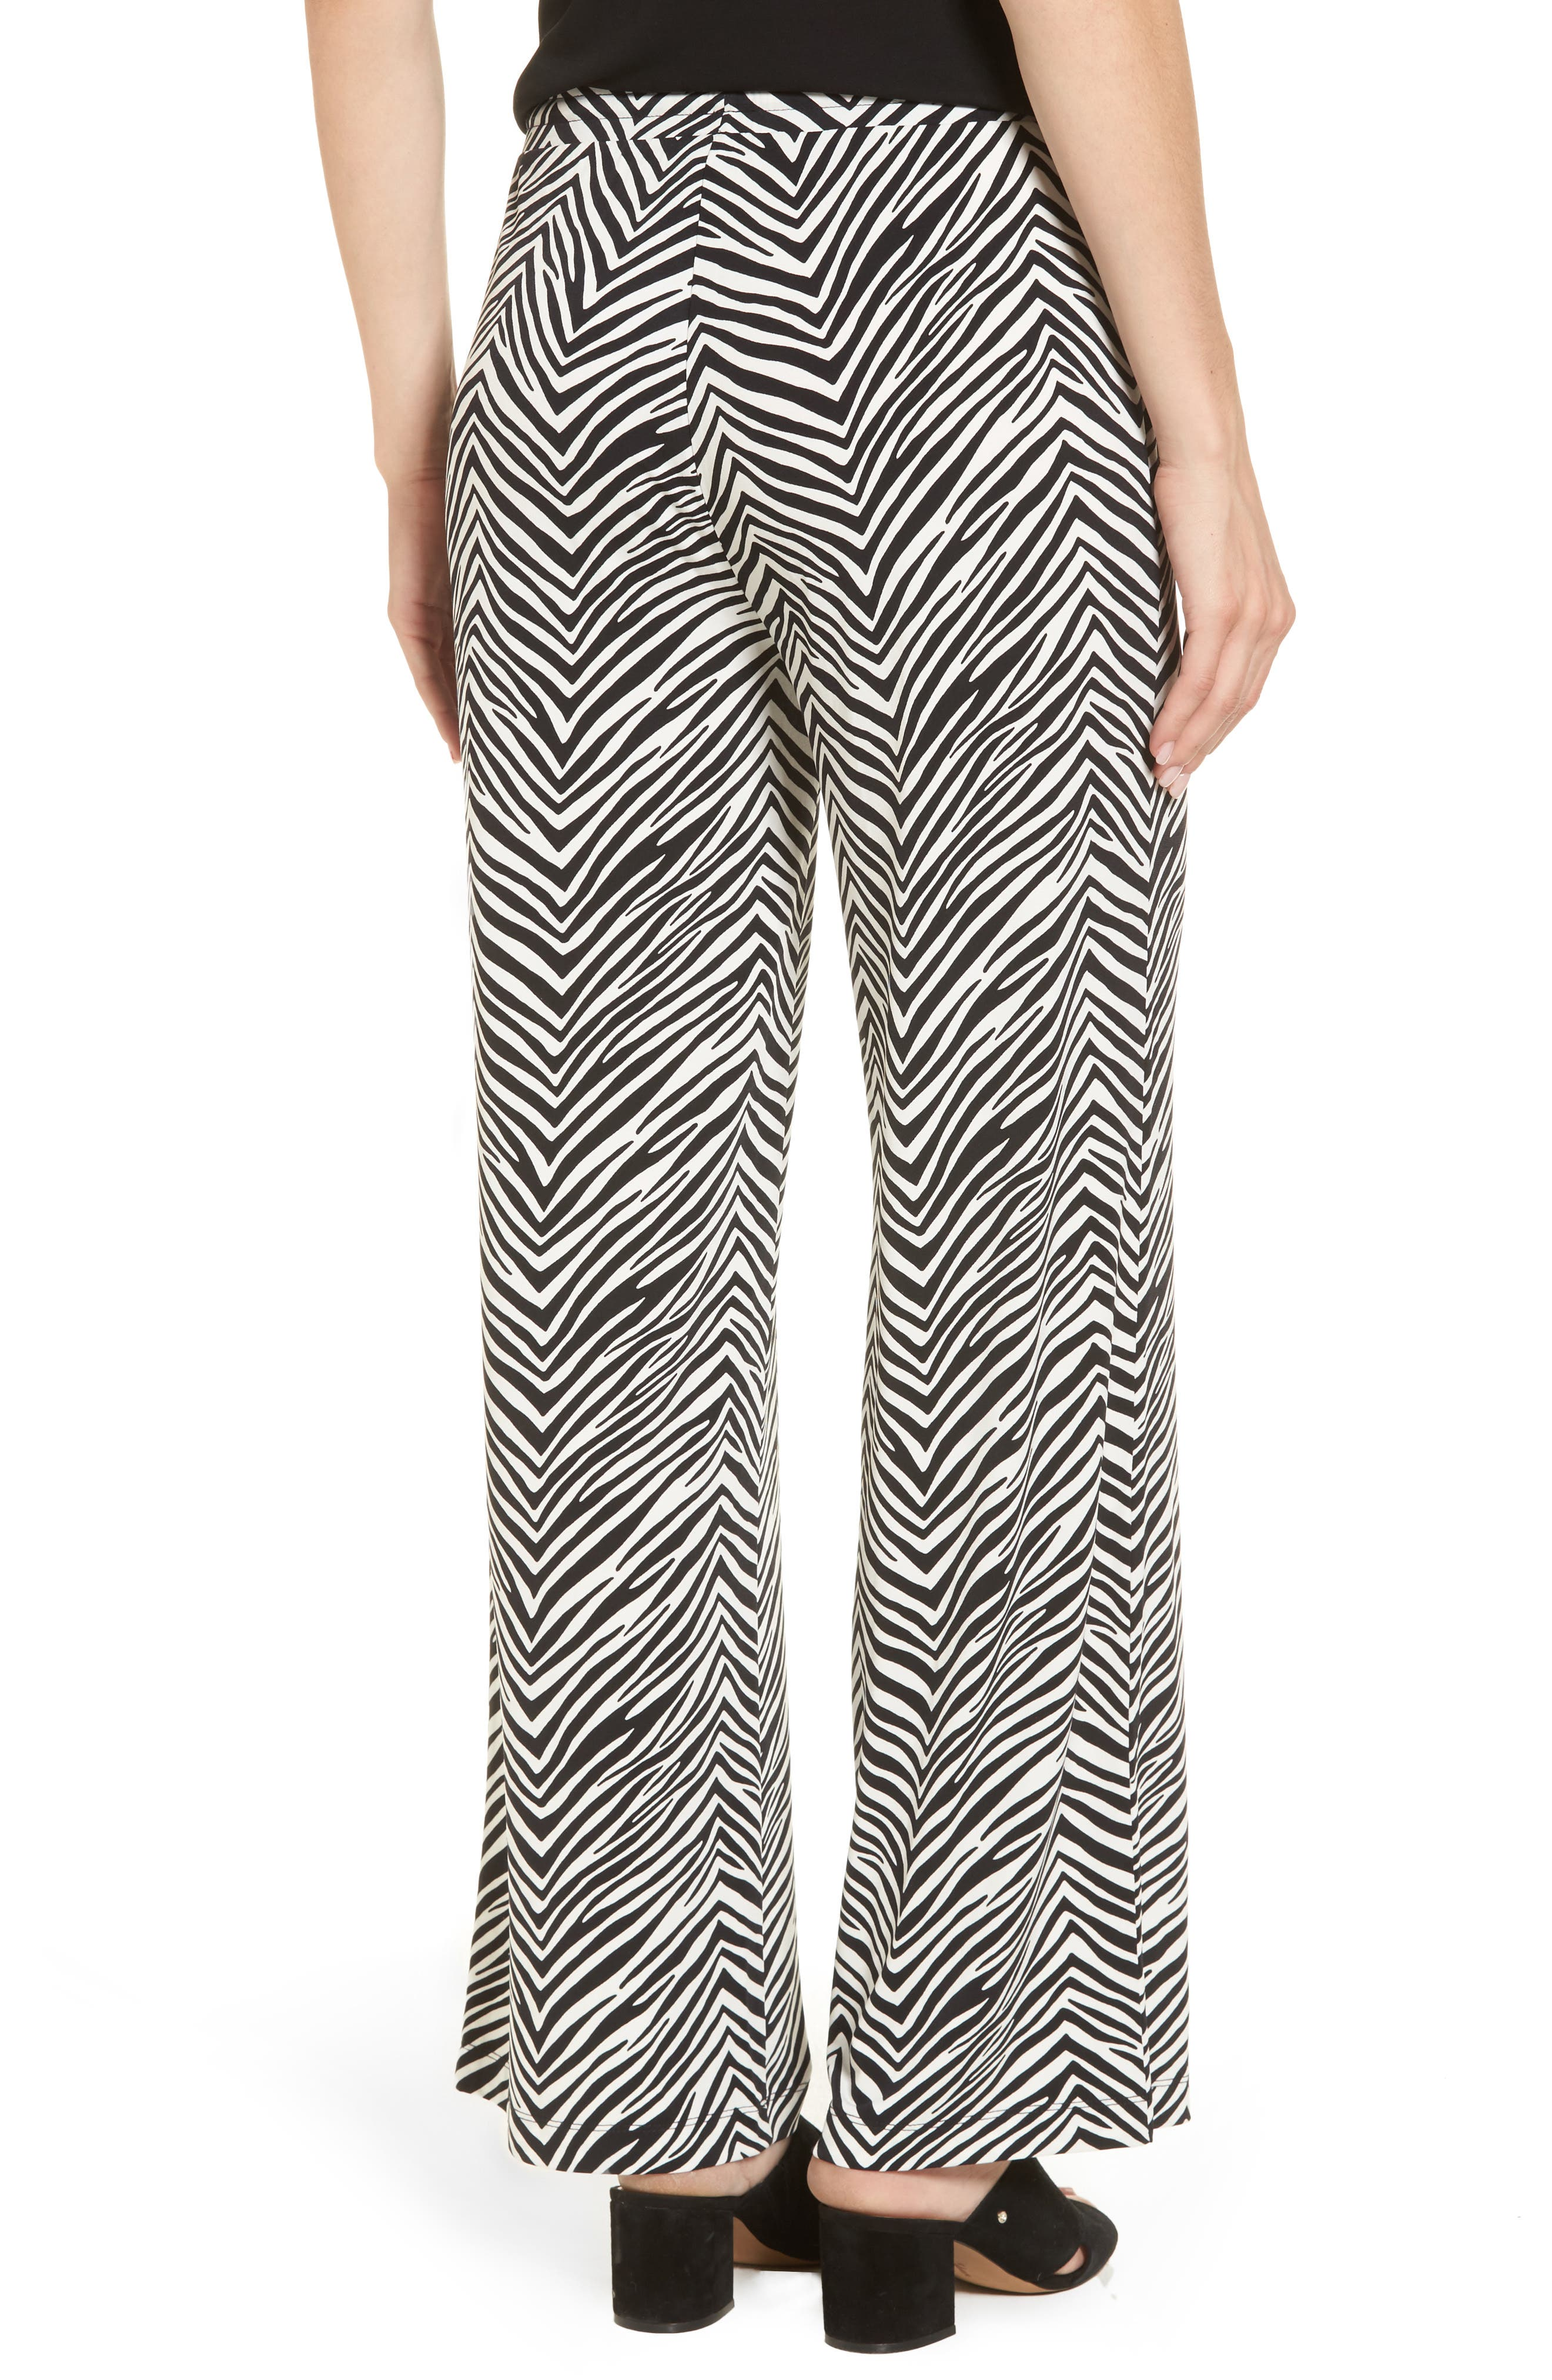 Zebra Print Drawstring Waist Pants,                             Alternate thumbnail 2, color,                             010